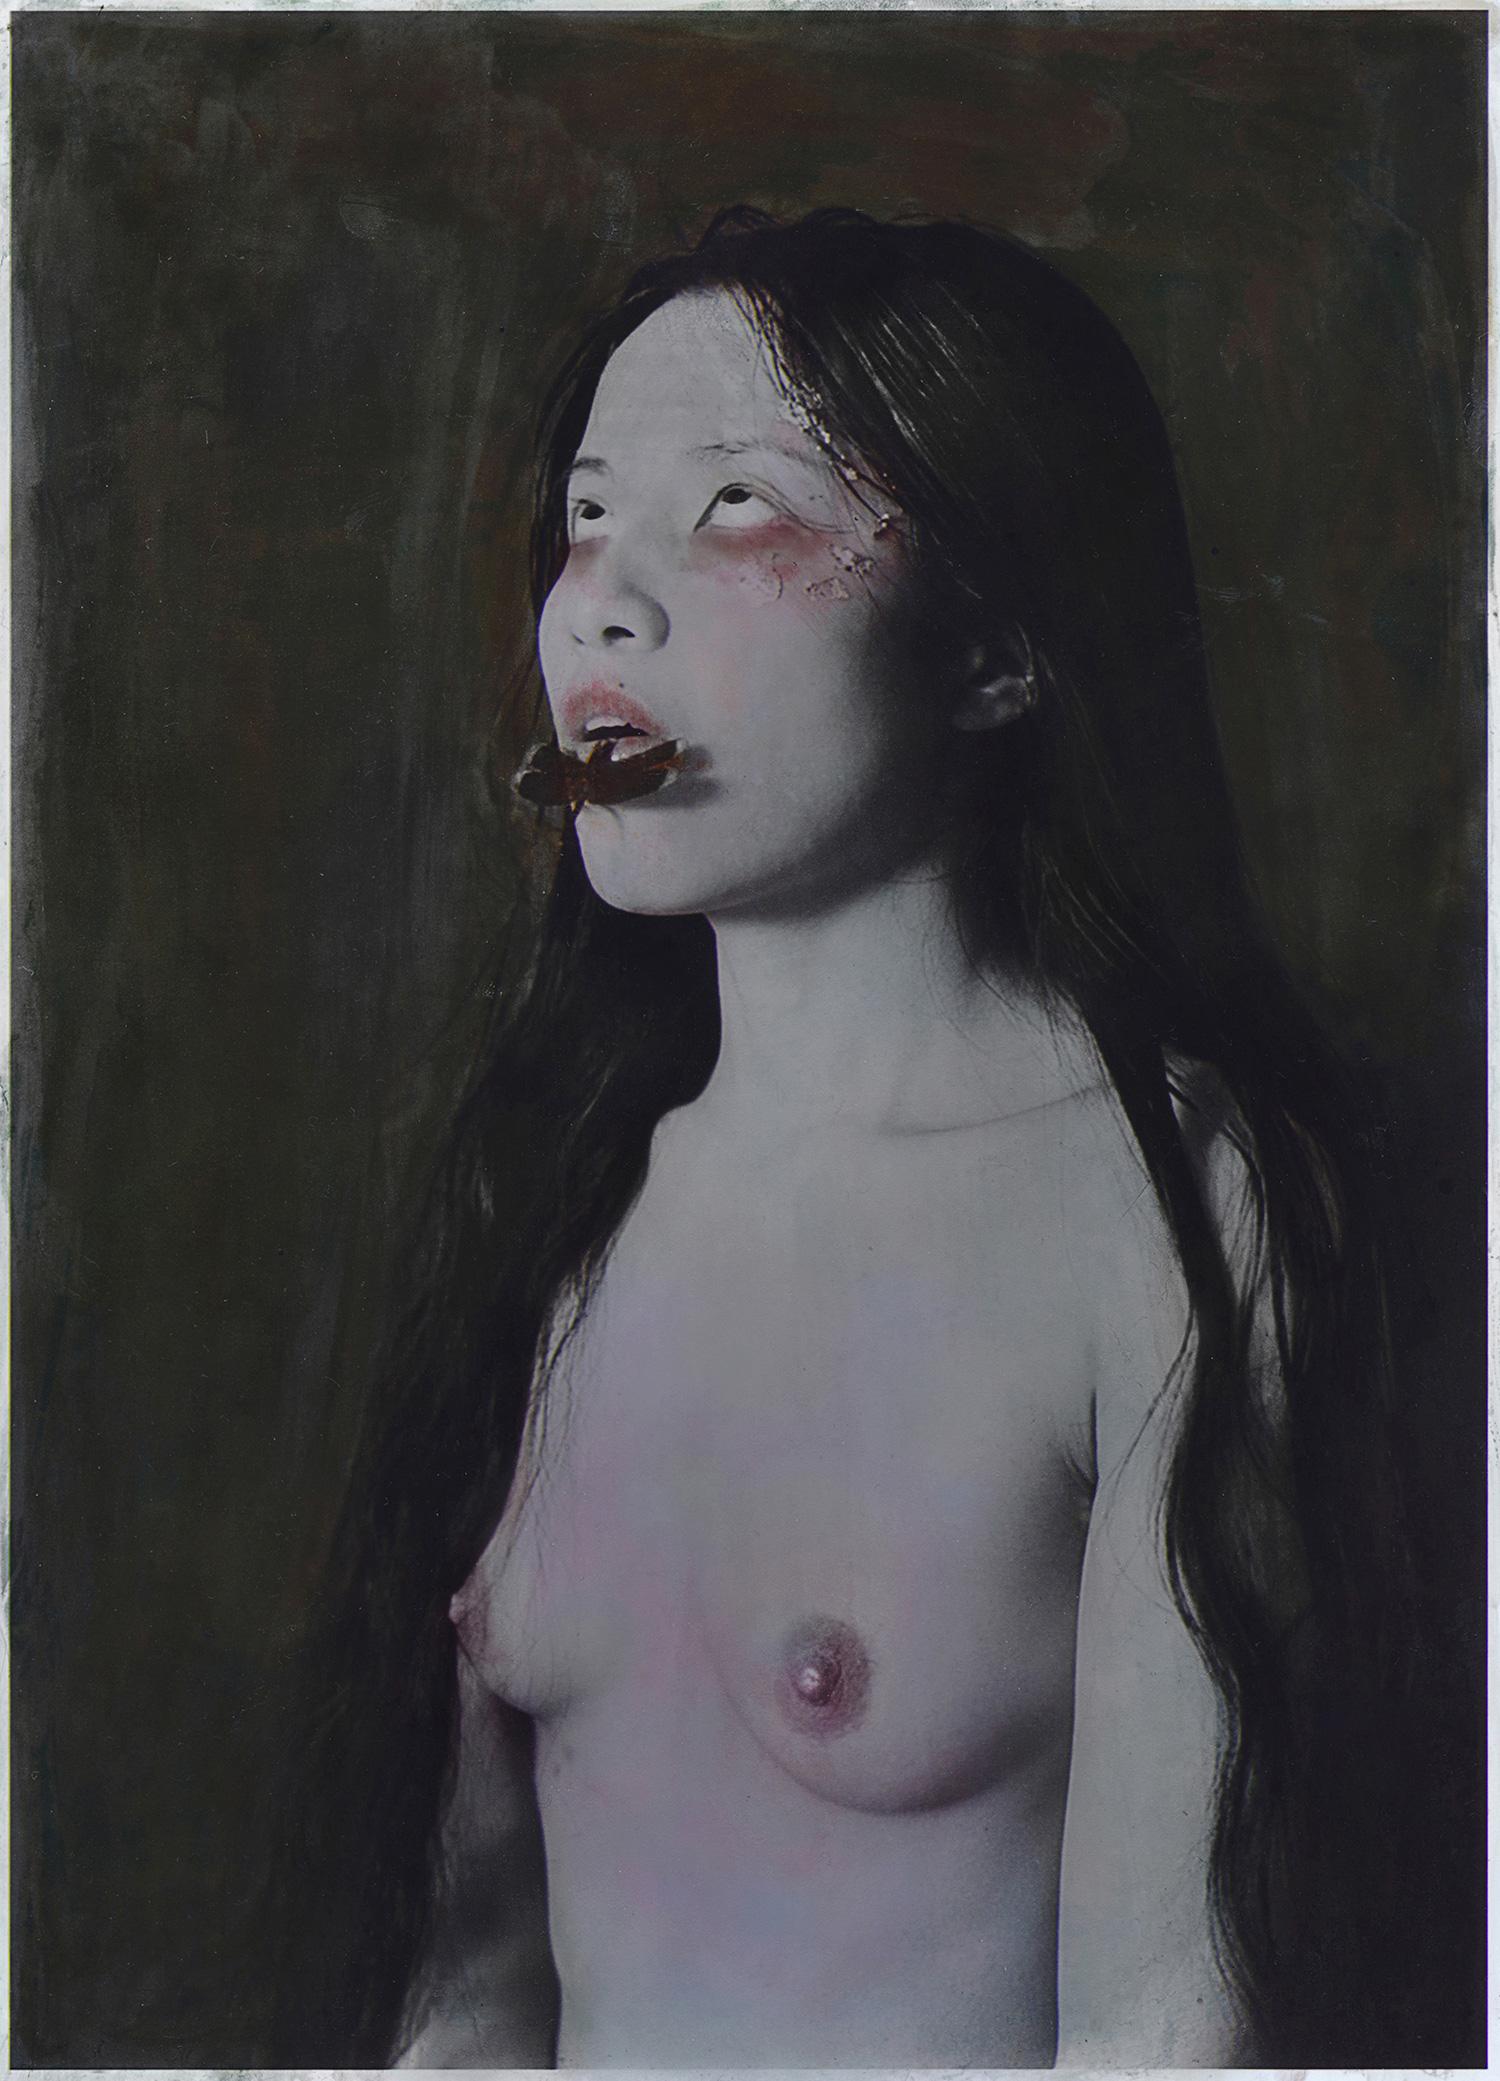 Katie Eleanor - life/blood remedy, creepy woman